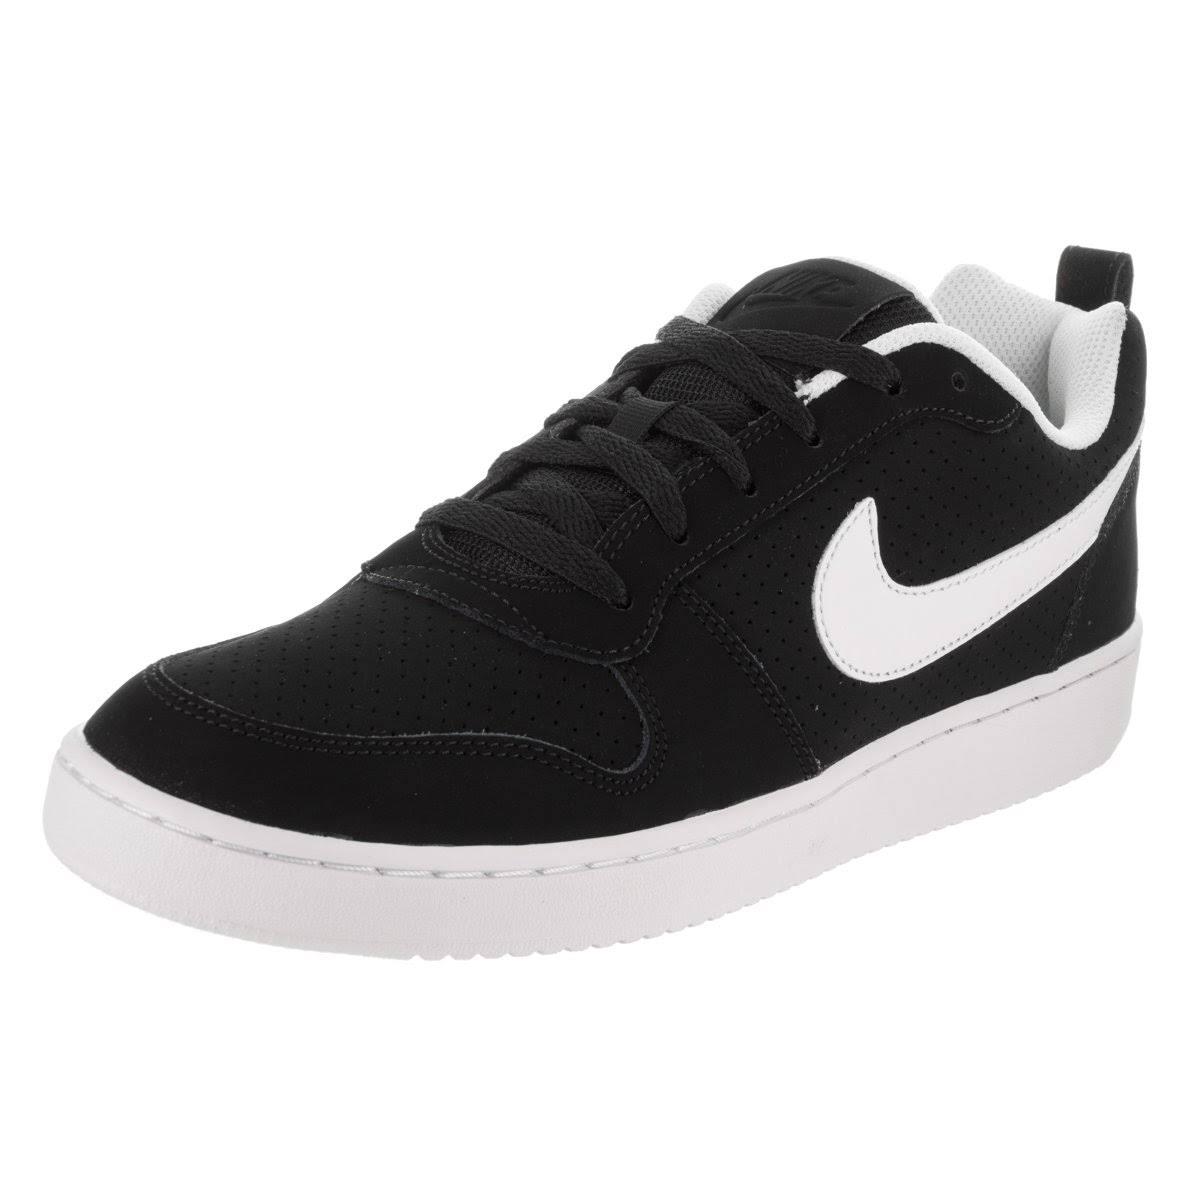 107175403 De 10 Court Baloncesto Borough Nike Men Calzado Negro Low Tamaño vwUq7OO